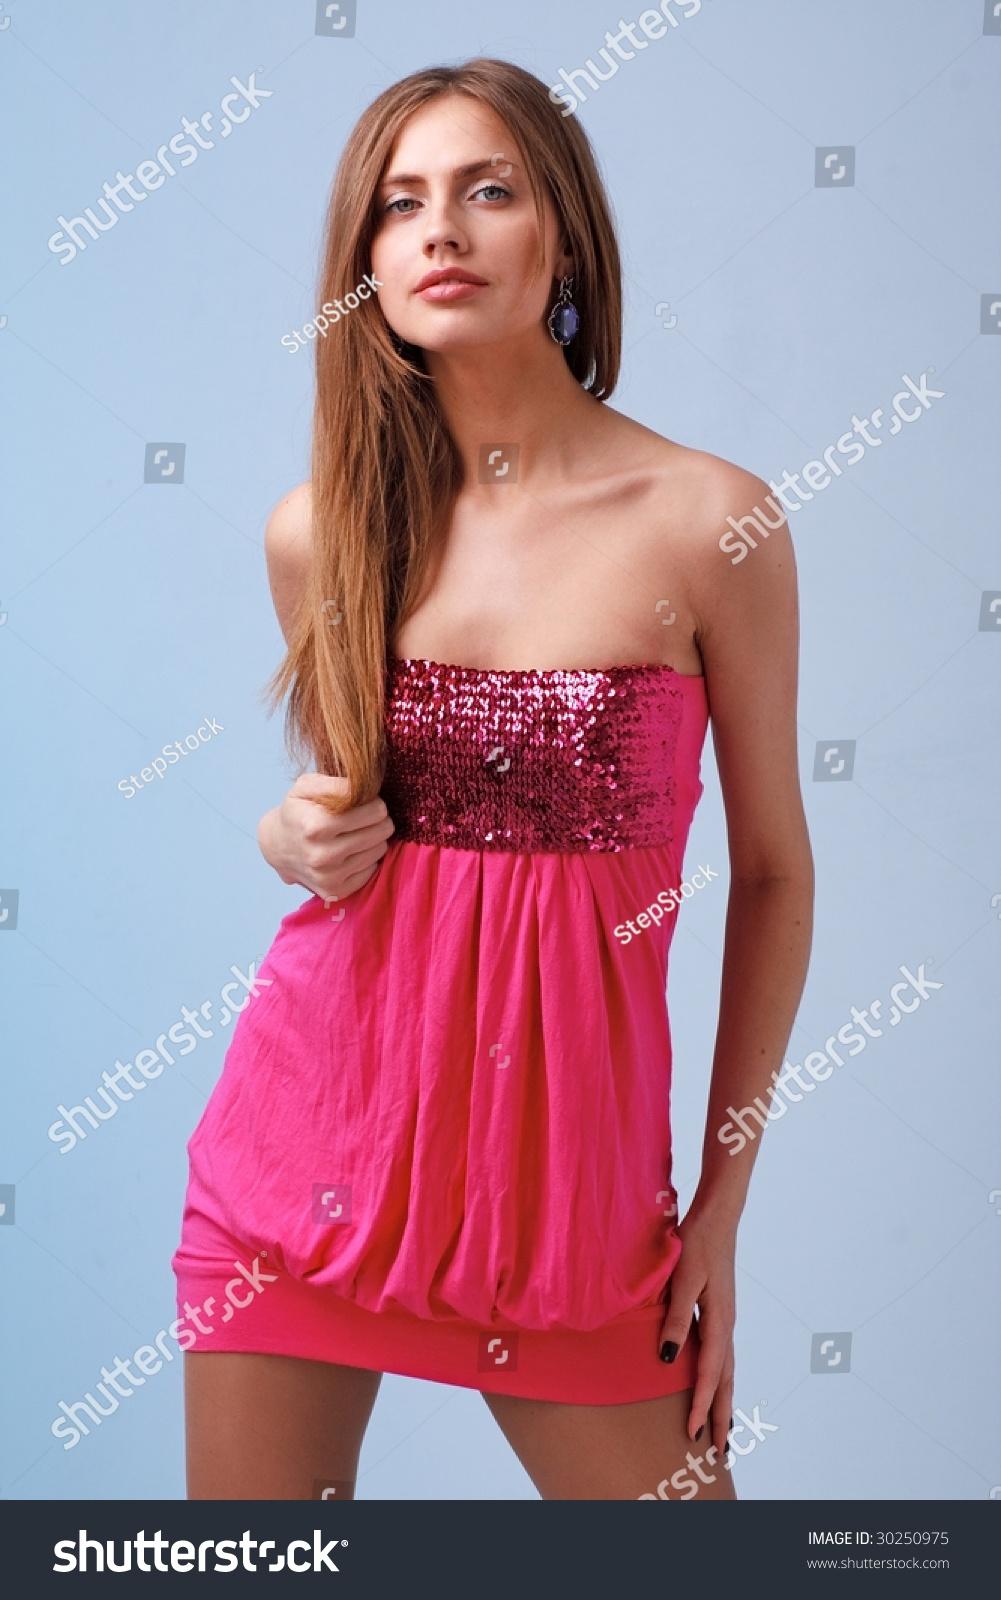 Popular Beautiful Yong Woman In Short Dress Royalty-Free Stock Photo | CartoonDealer.com #9815523